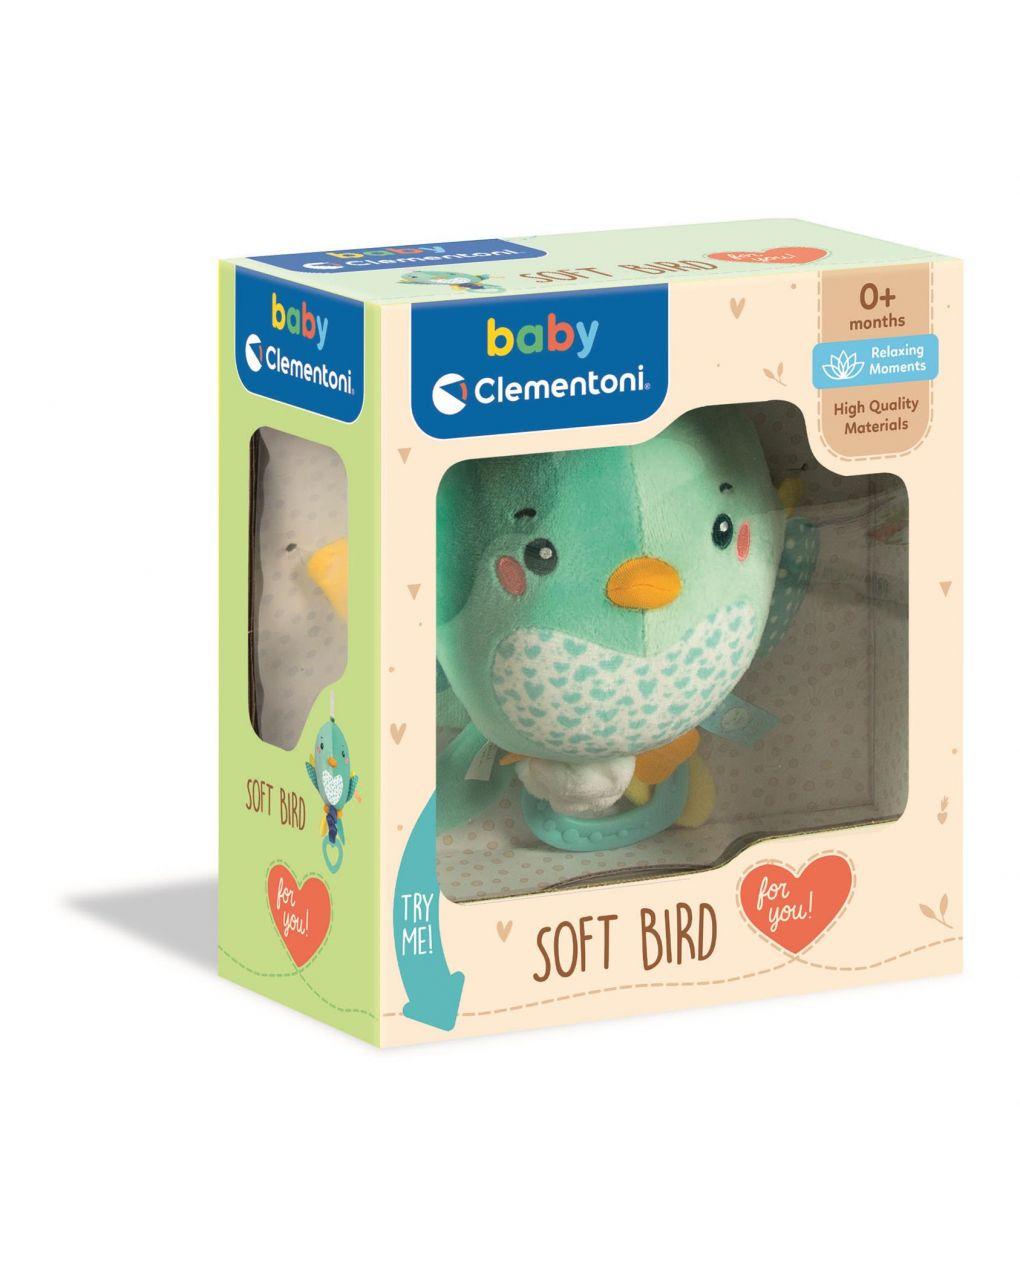 Baby clementoni - soft bird - Clementoni